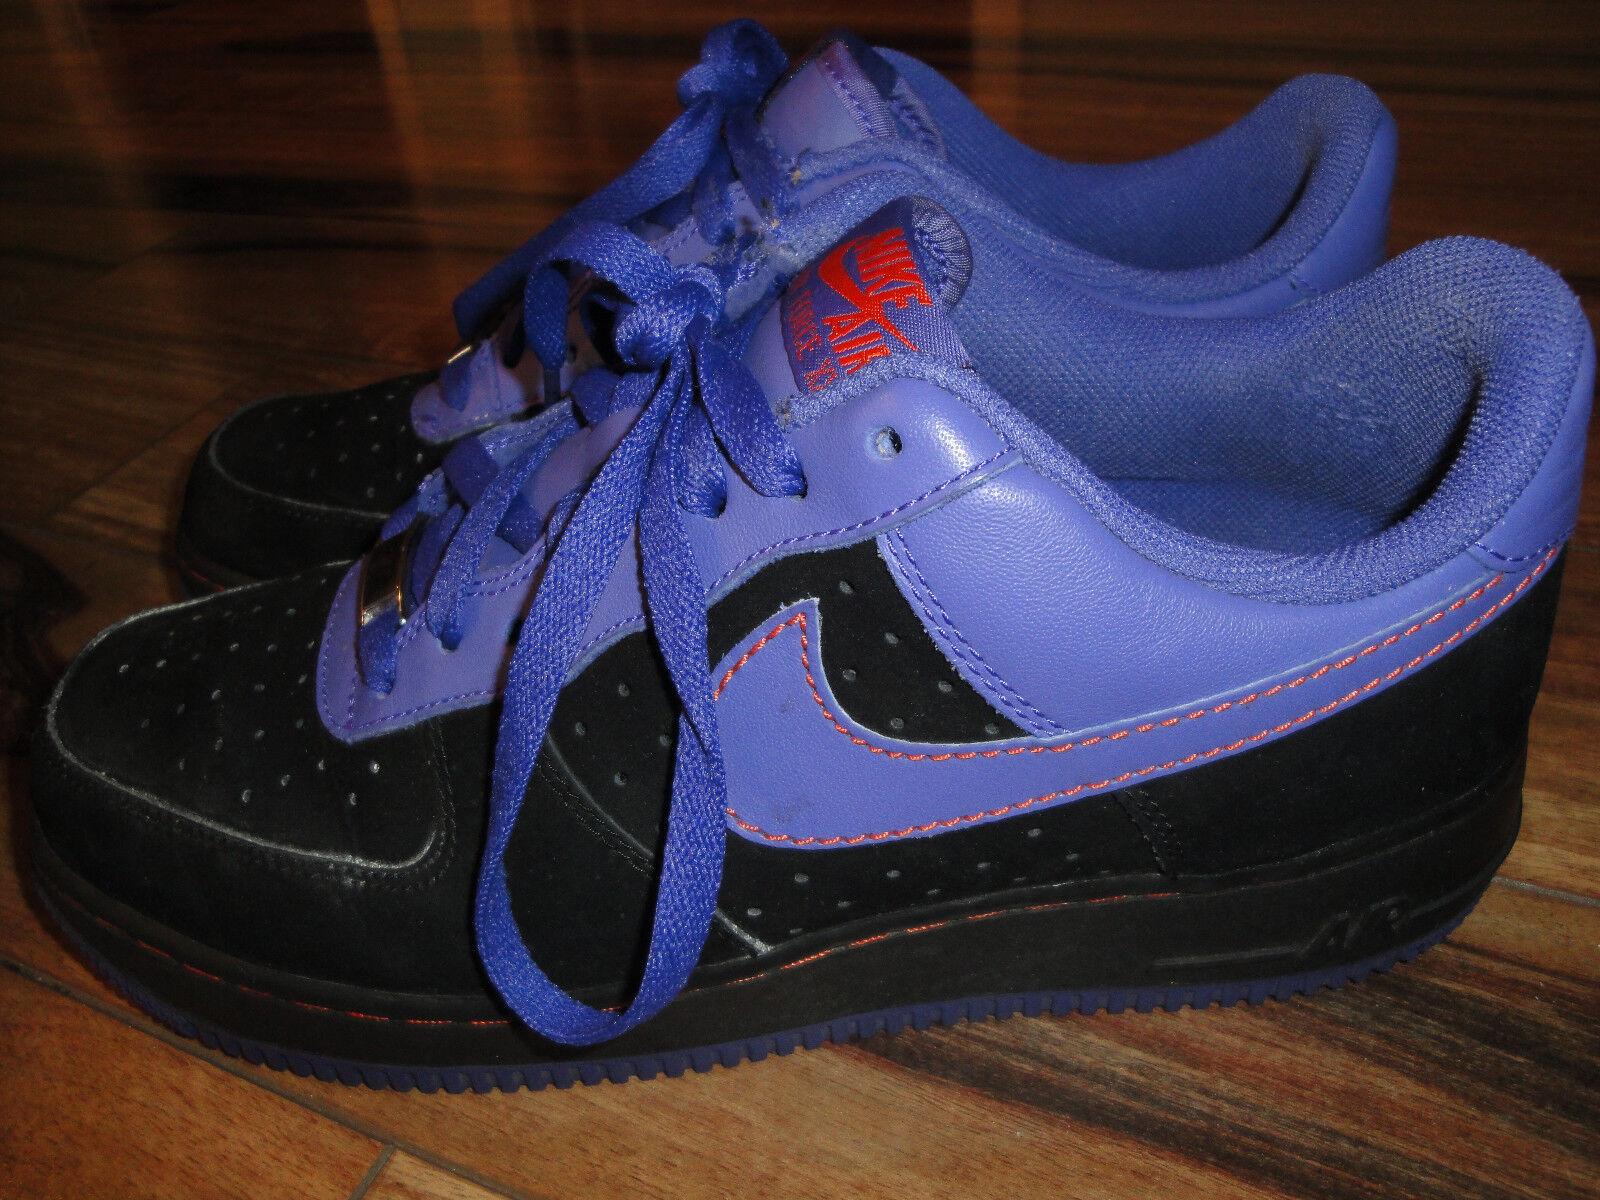 Nike stile air force 1 bassa dimensione 9 stile Nike mismate nero e viola 76f14c